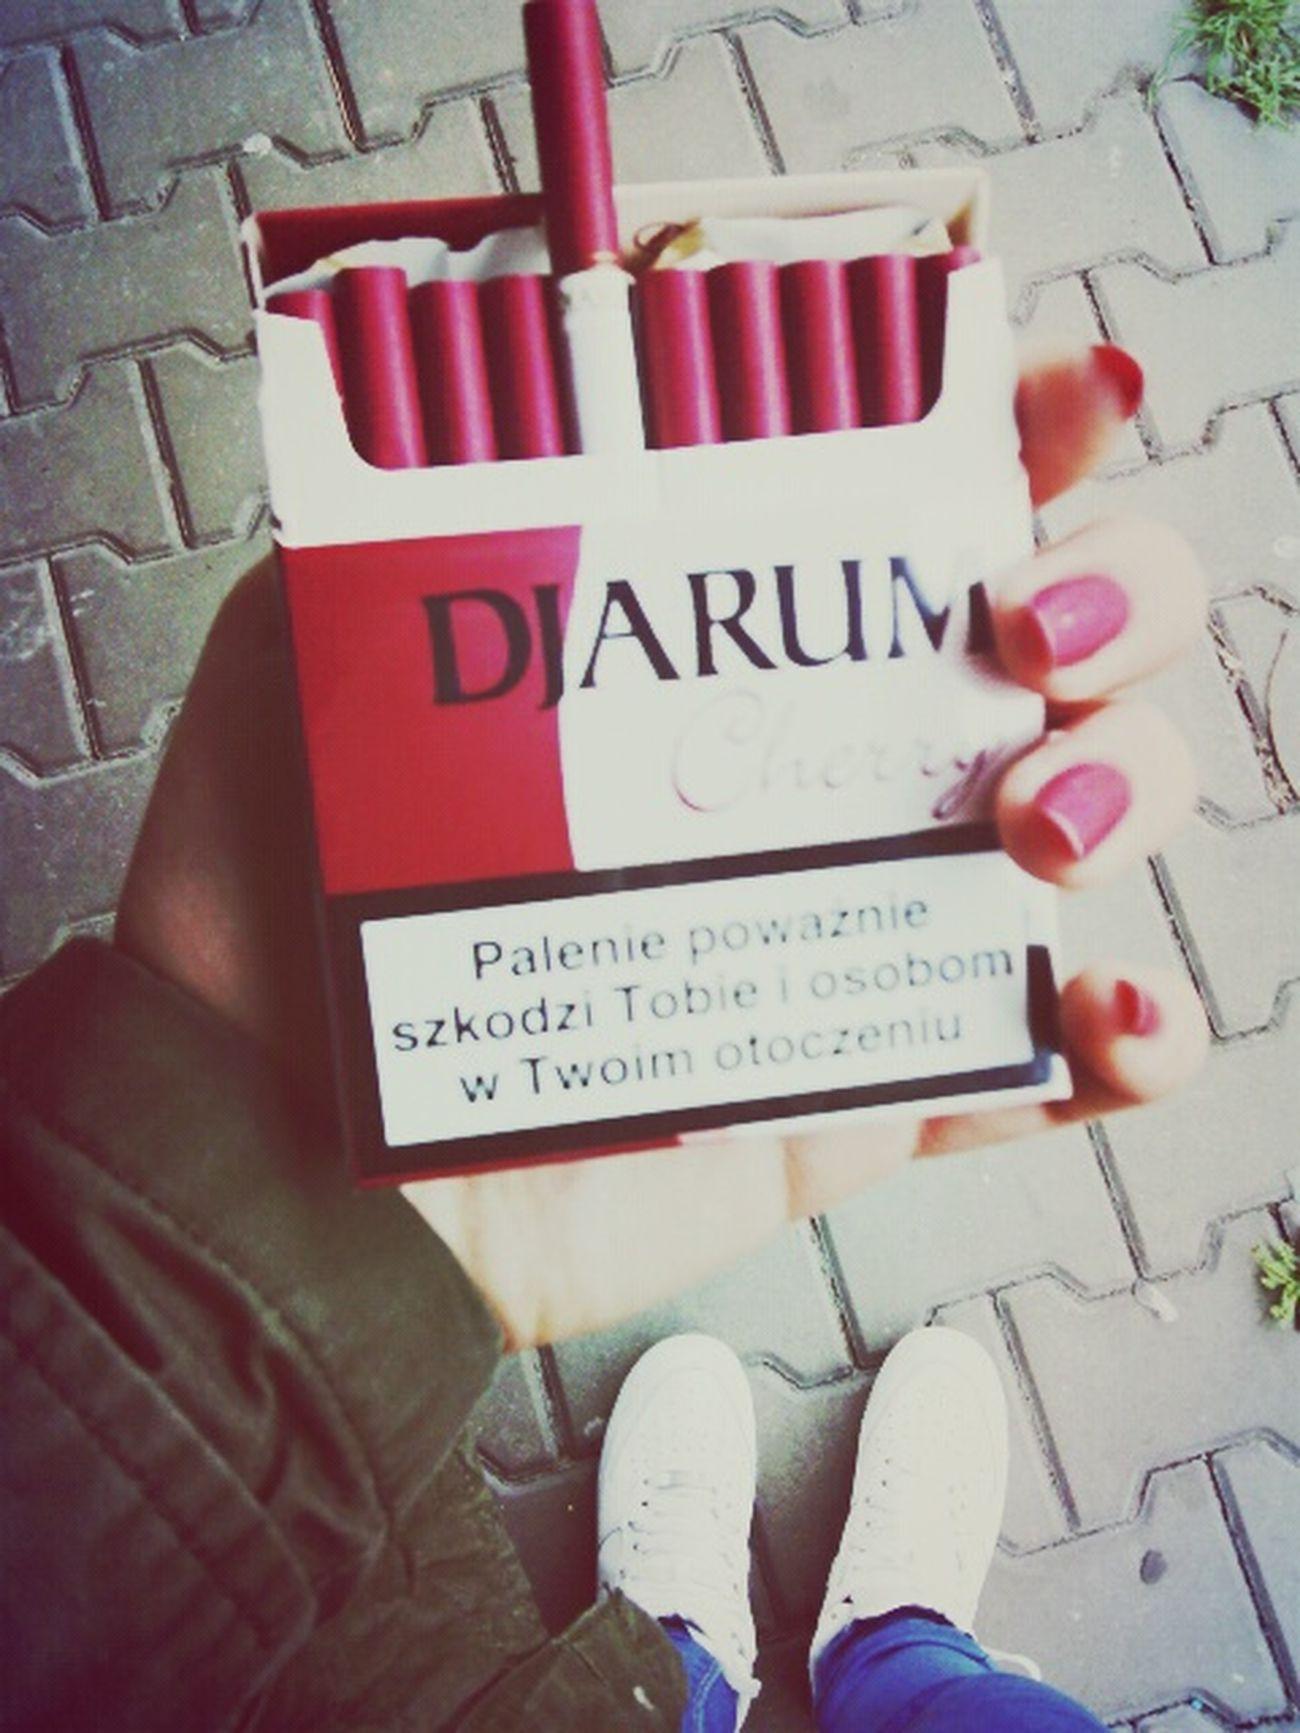 Smoke Djarum Chery Pink Cigarettes